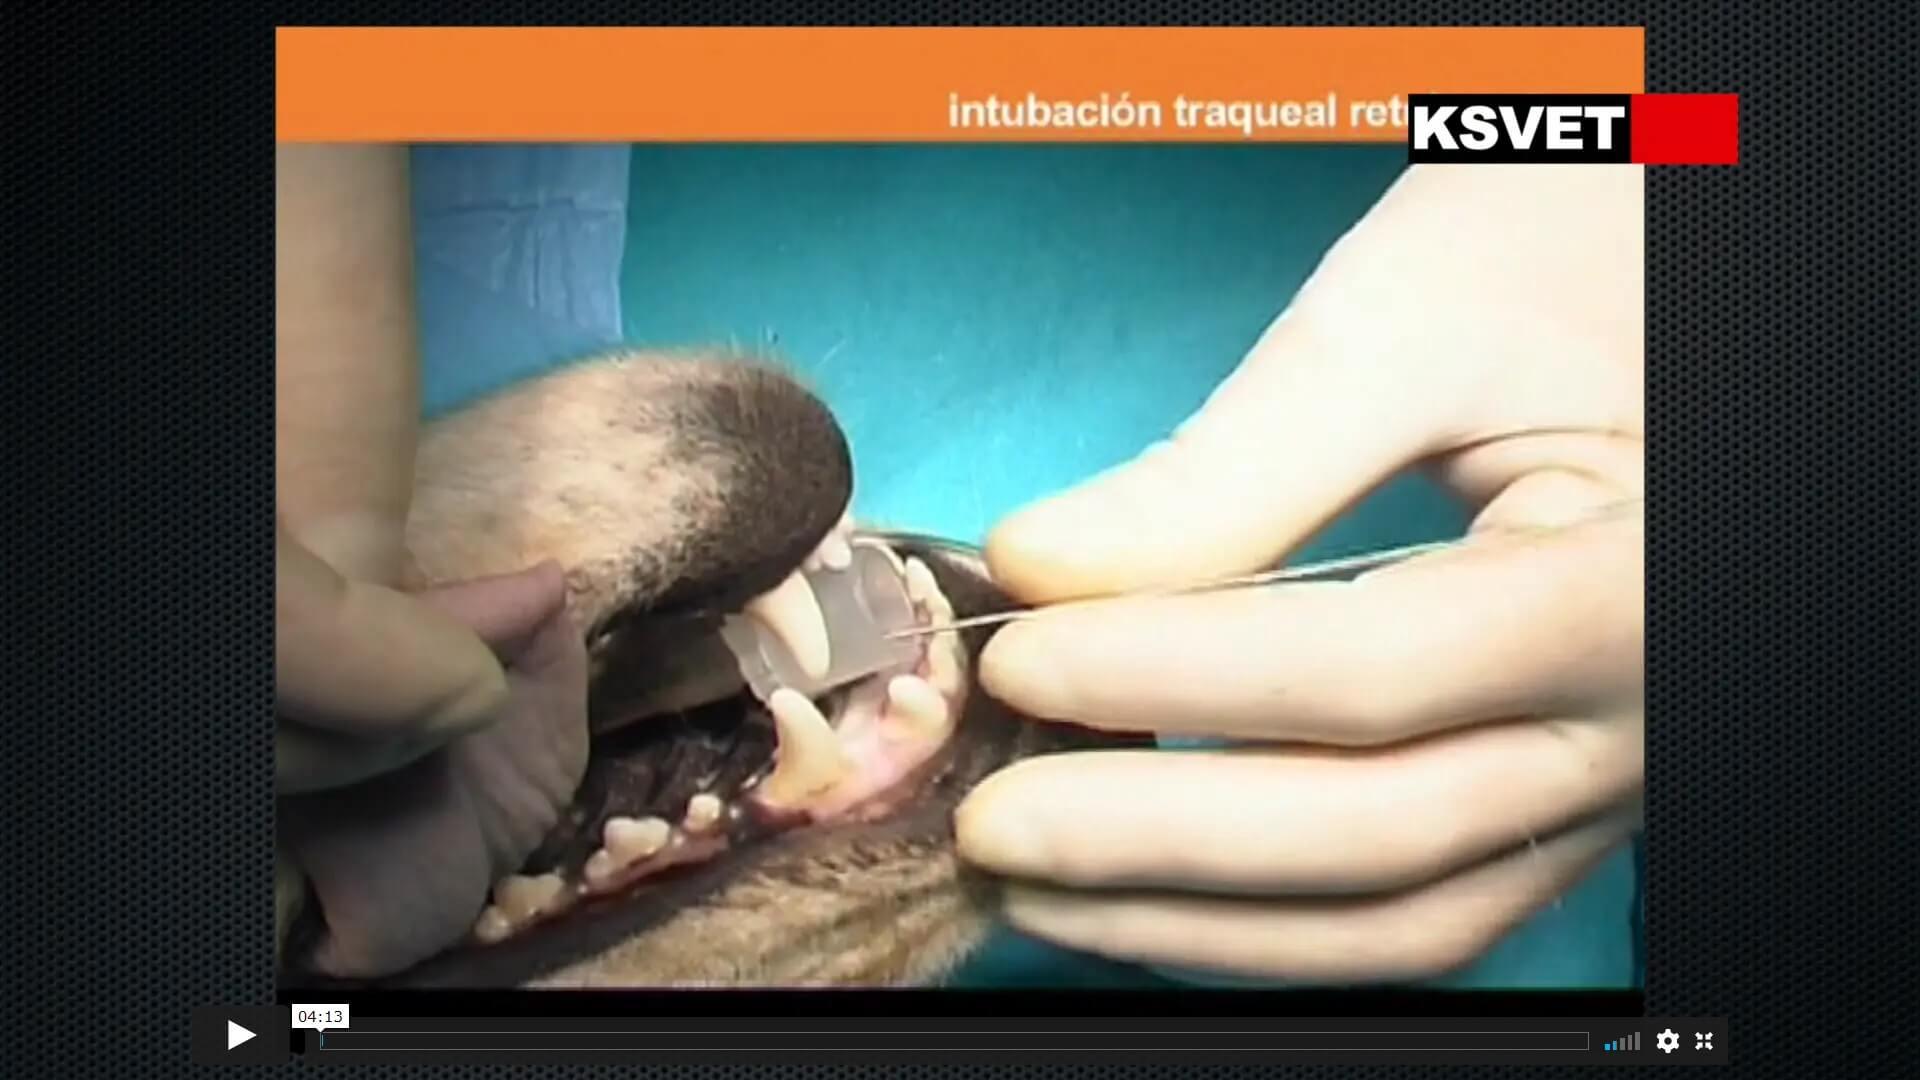 Intubación traqueal retrógrada